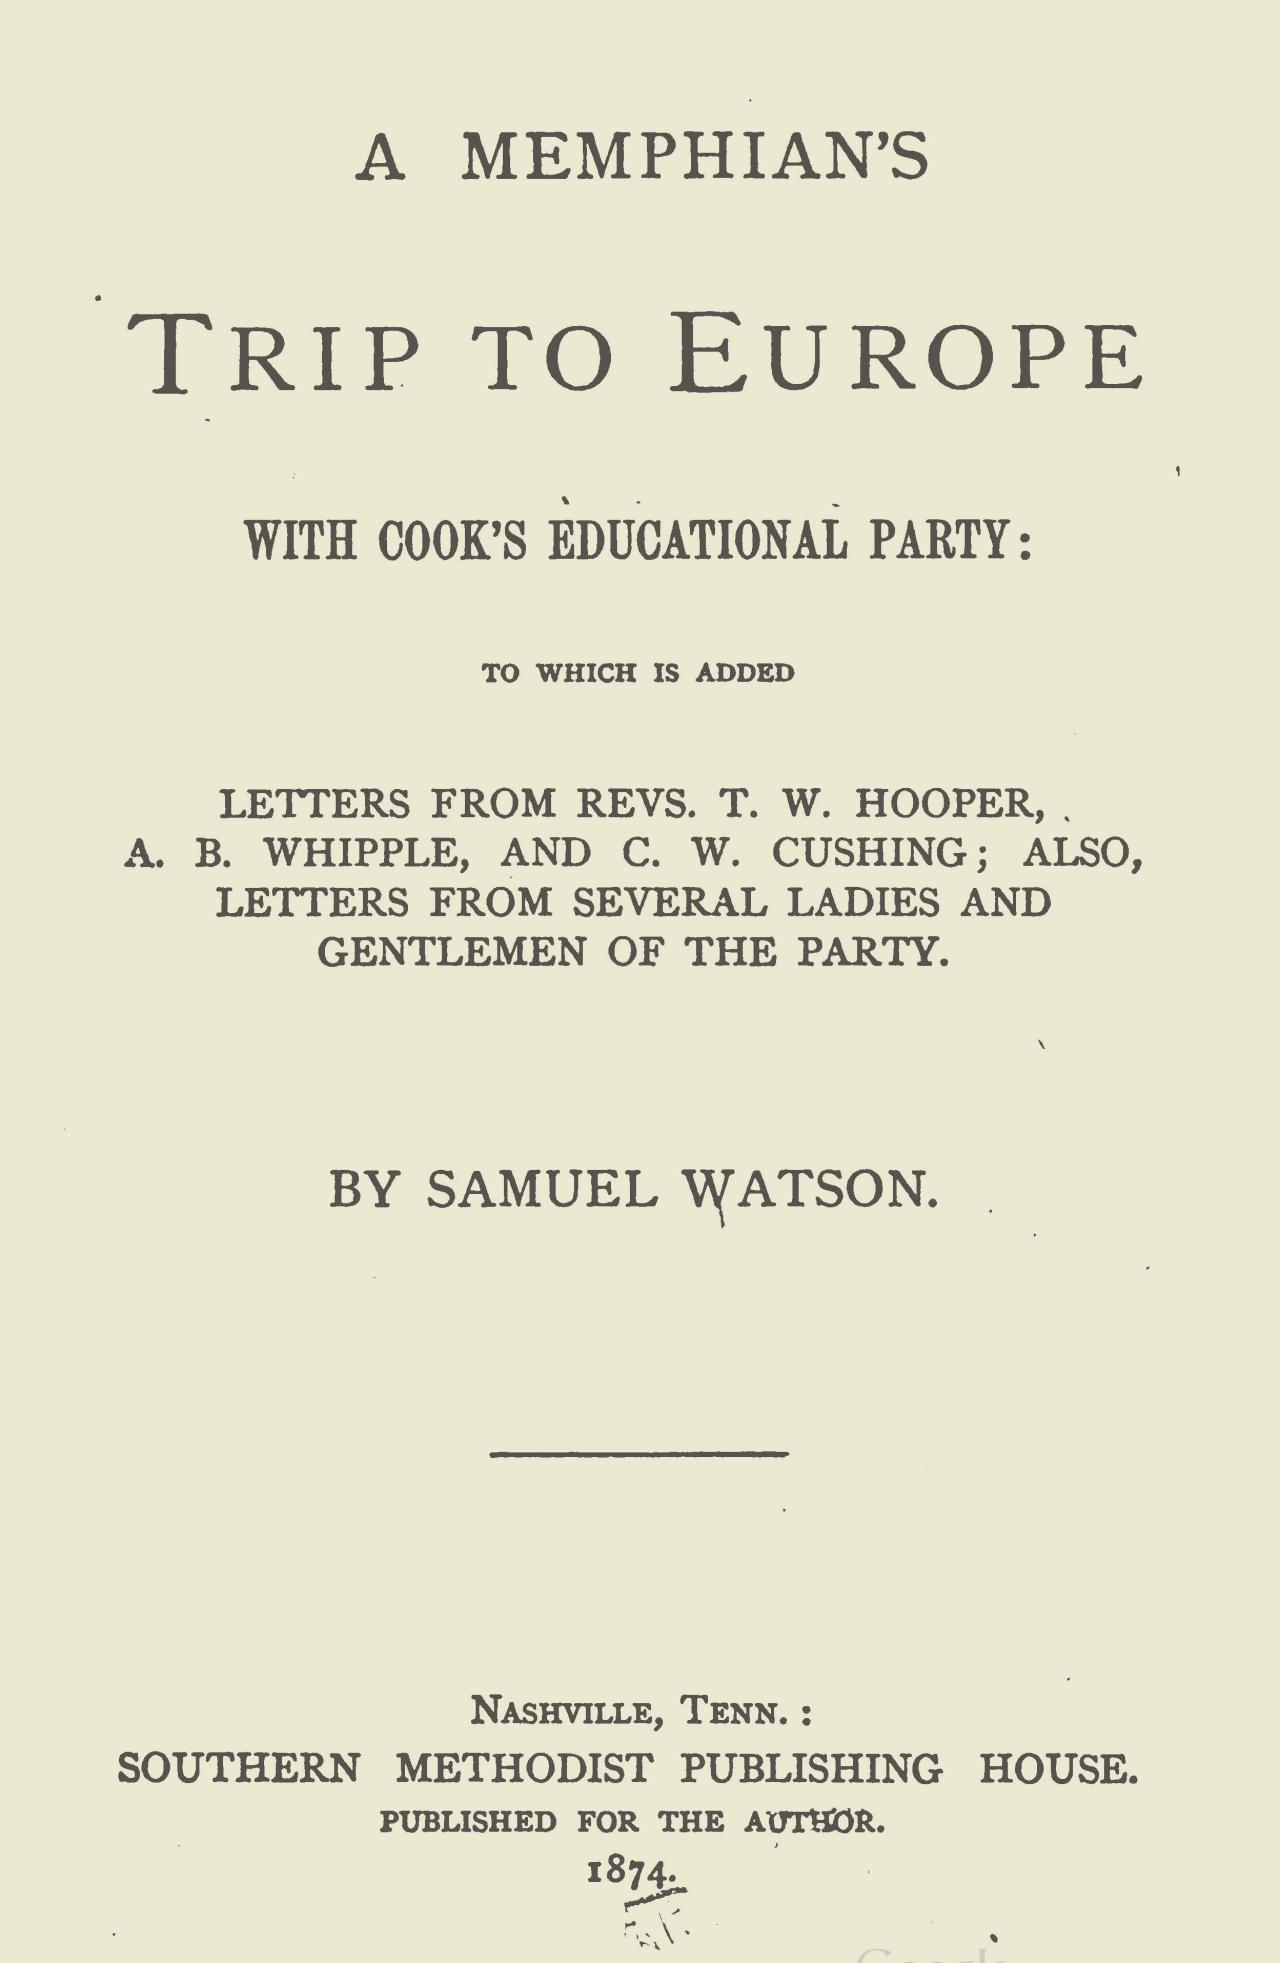 Hooper, Thomas Williamson, A Memphian's Trip to Europe Title Page.jpg